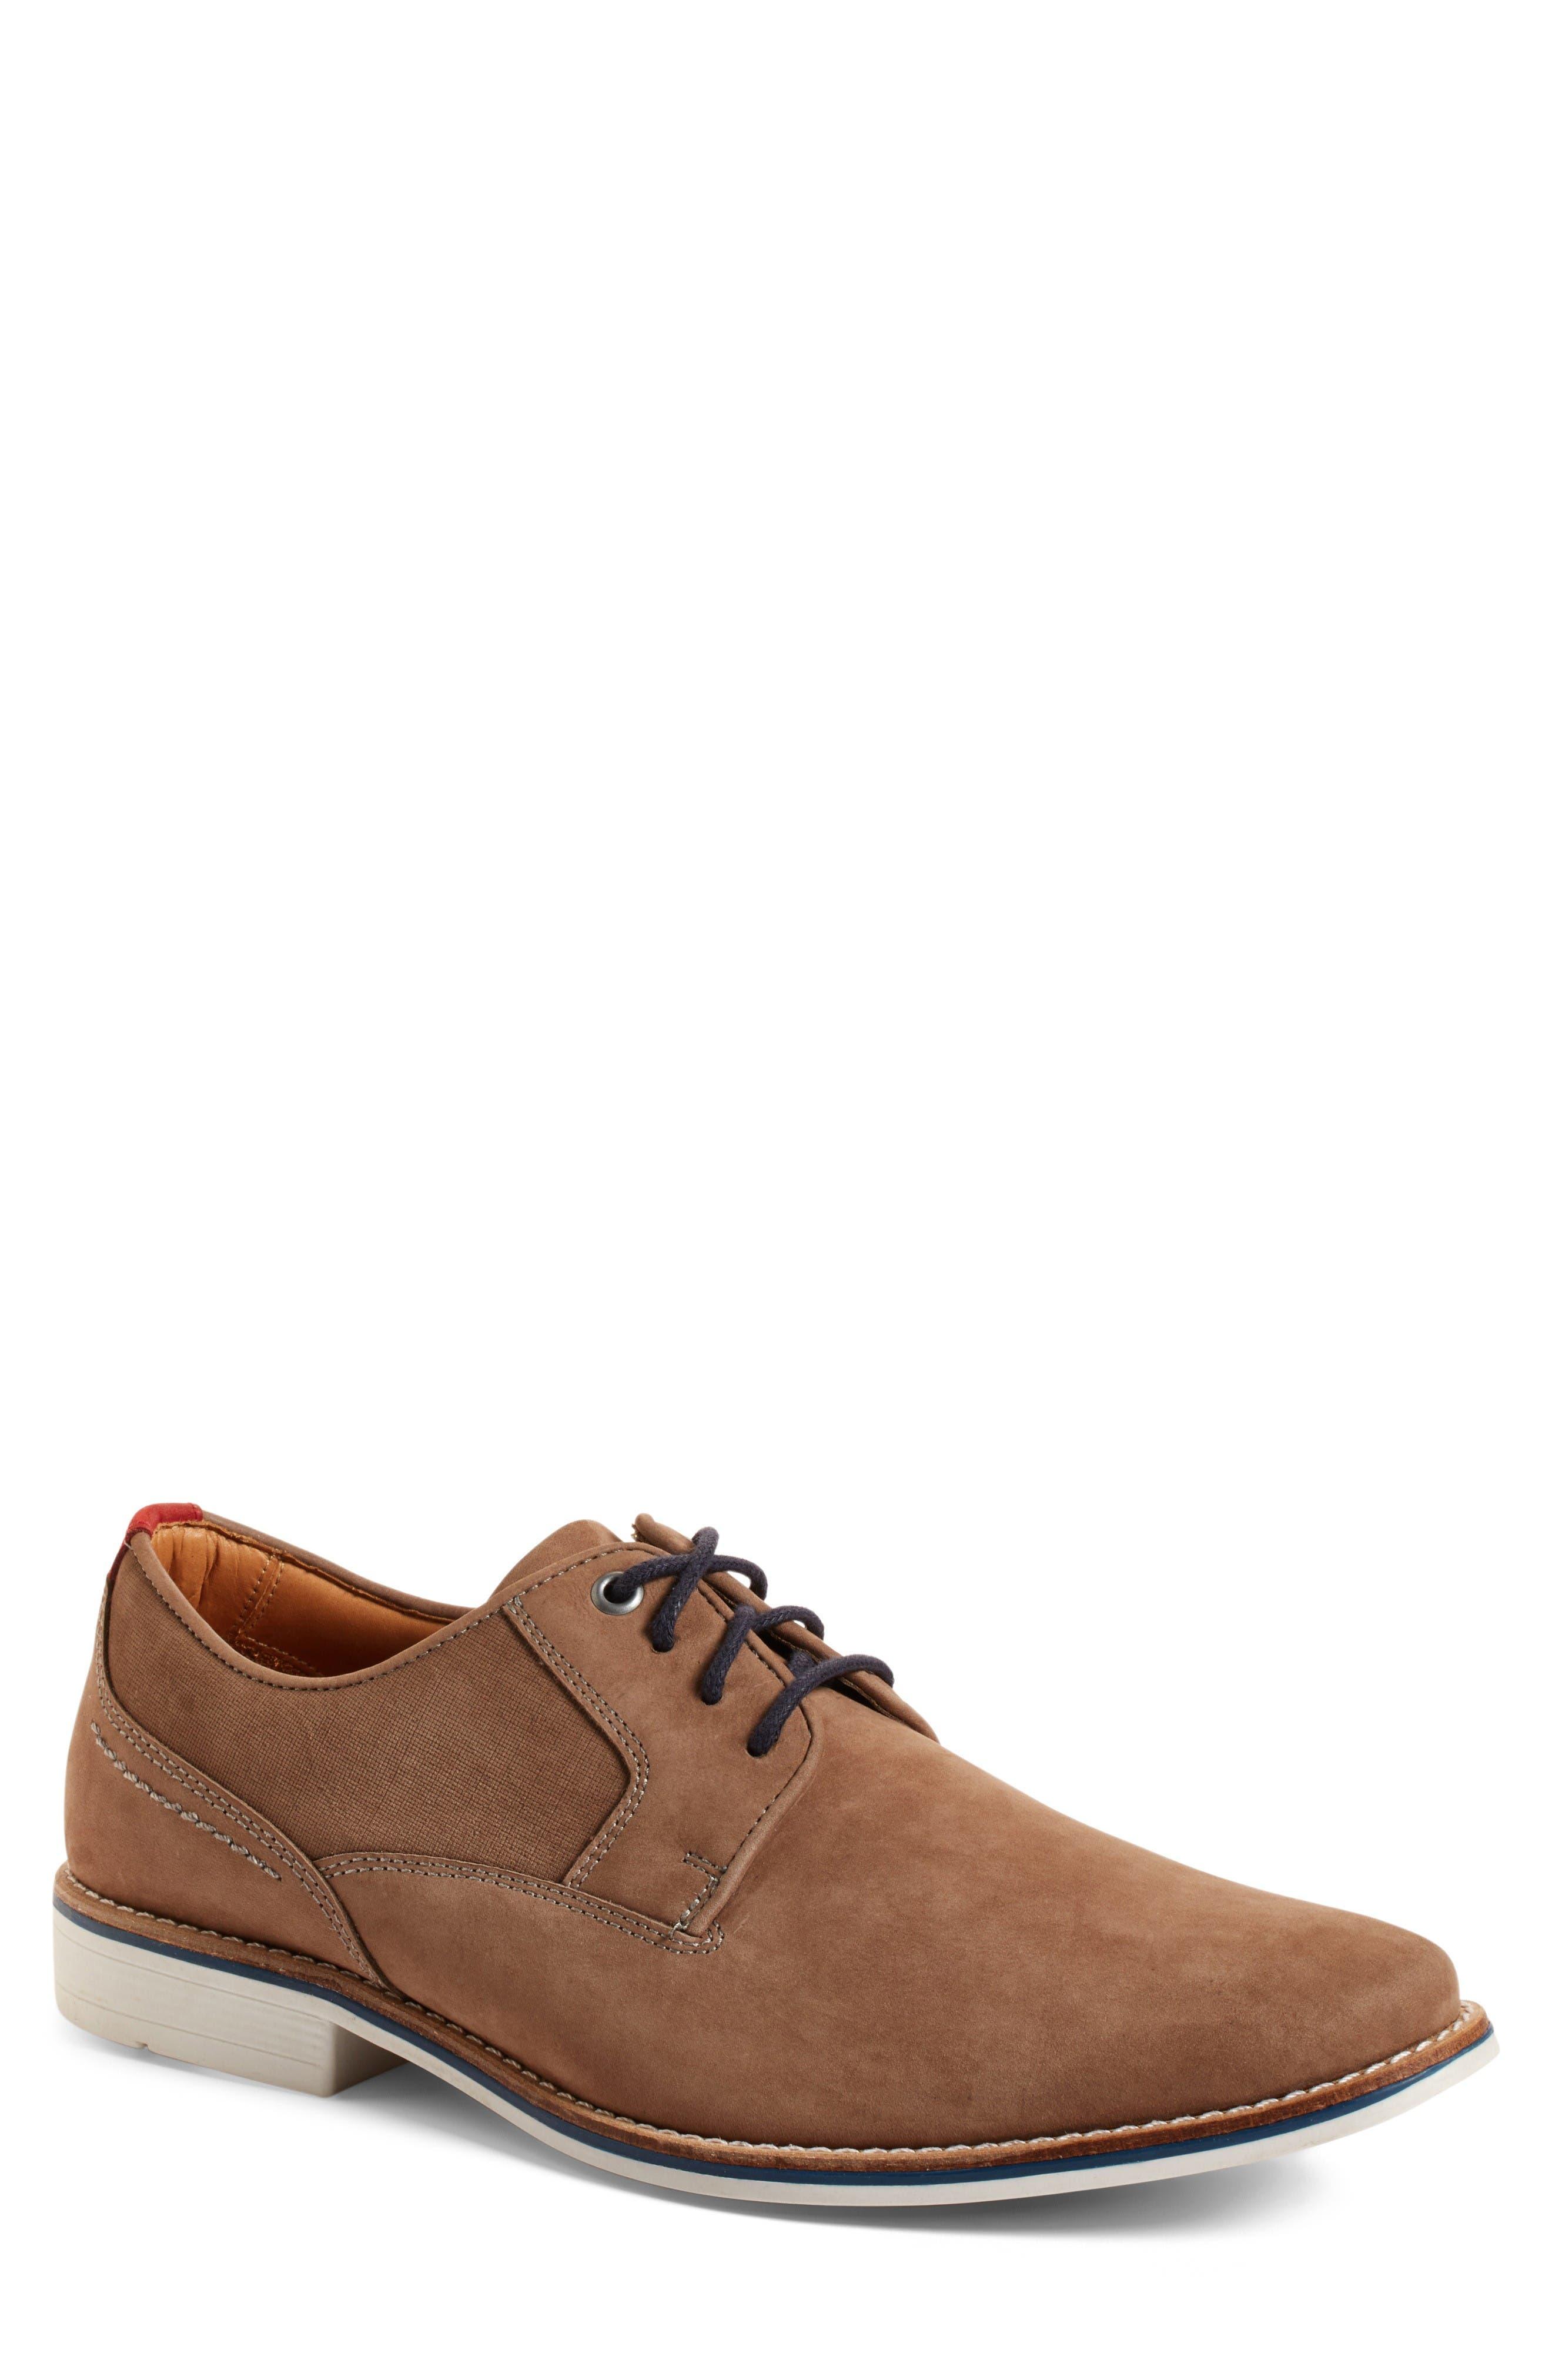 Alternate Image 1 Selected - 1901 Archer Buck Shoe (Men)